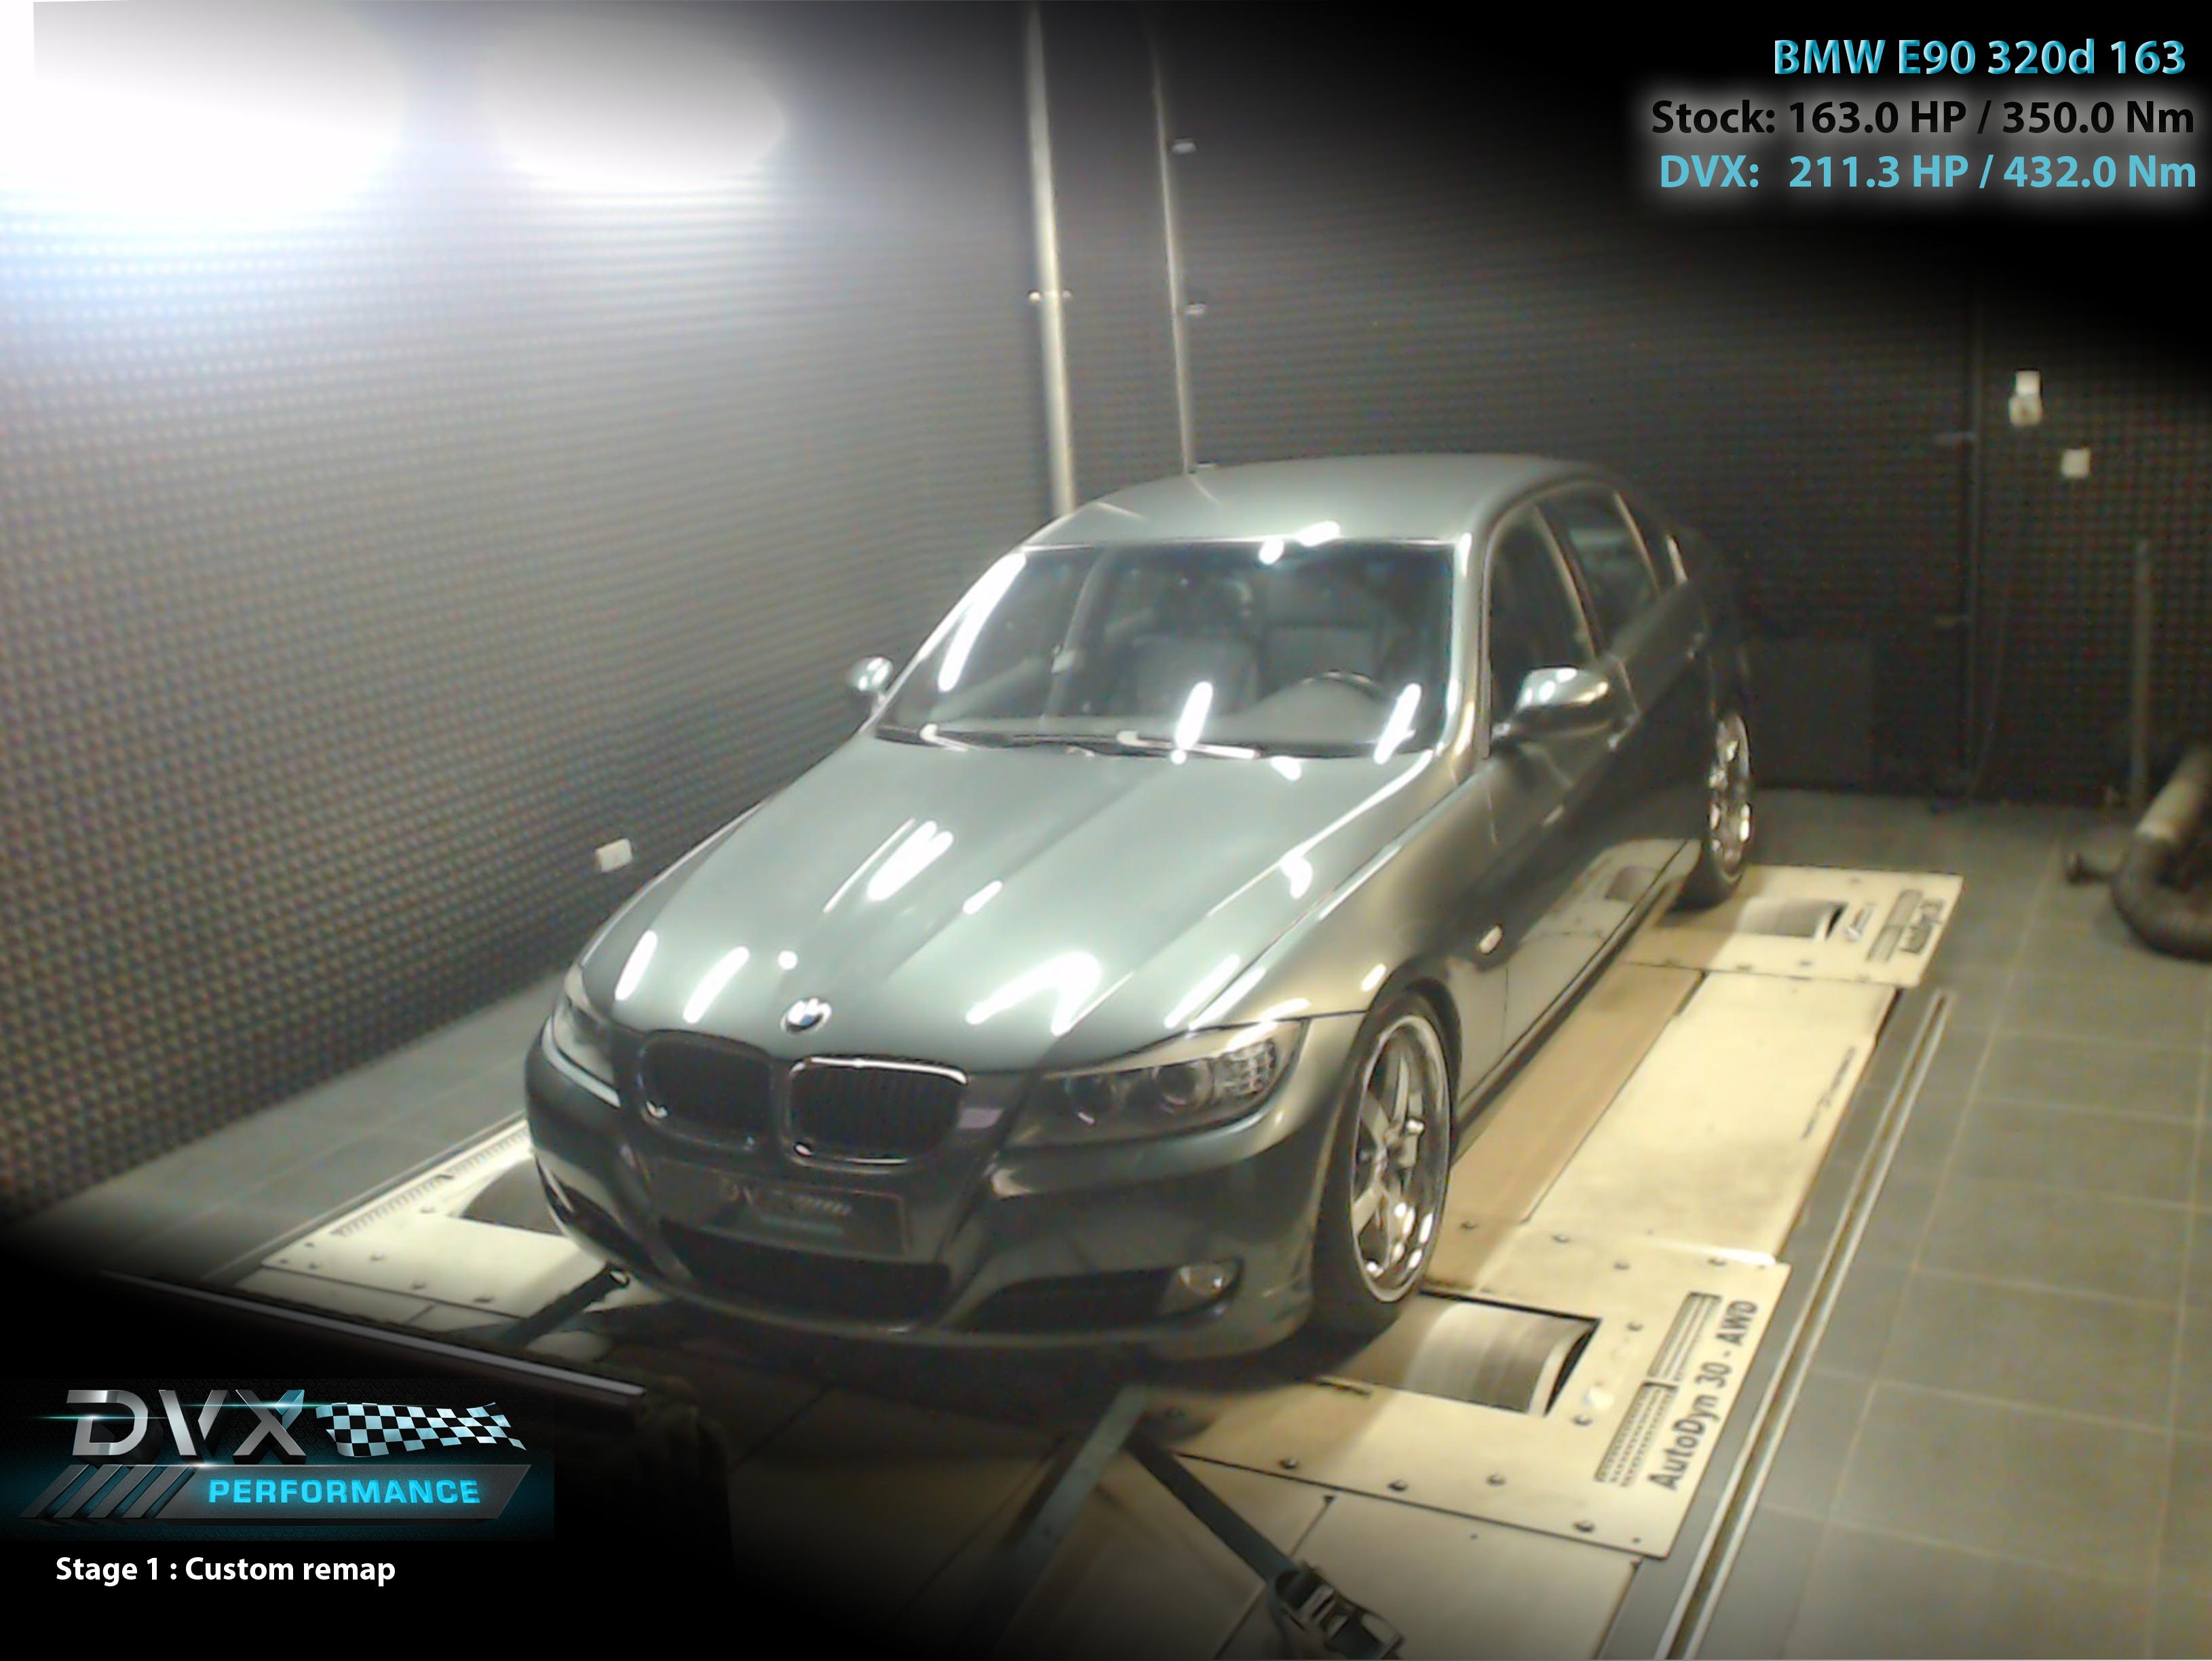 DVX Performance - BMW - E90 -2010 ->2011 - 320d - 163PK